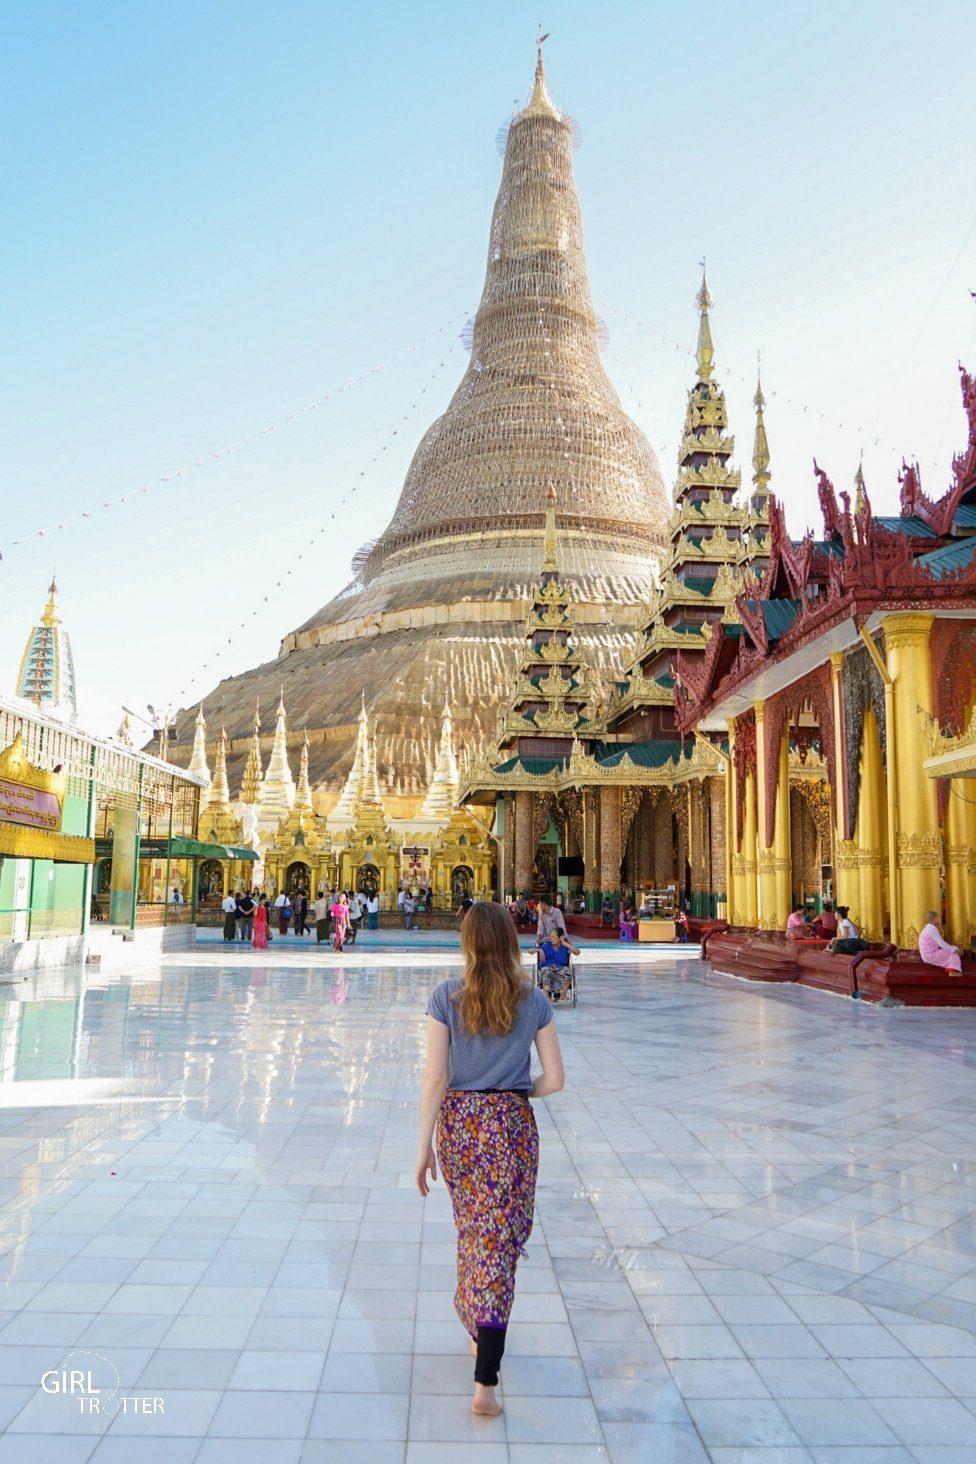 Stupa principale de la Pagode Shwe da gon de Yangon en Birmanie